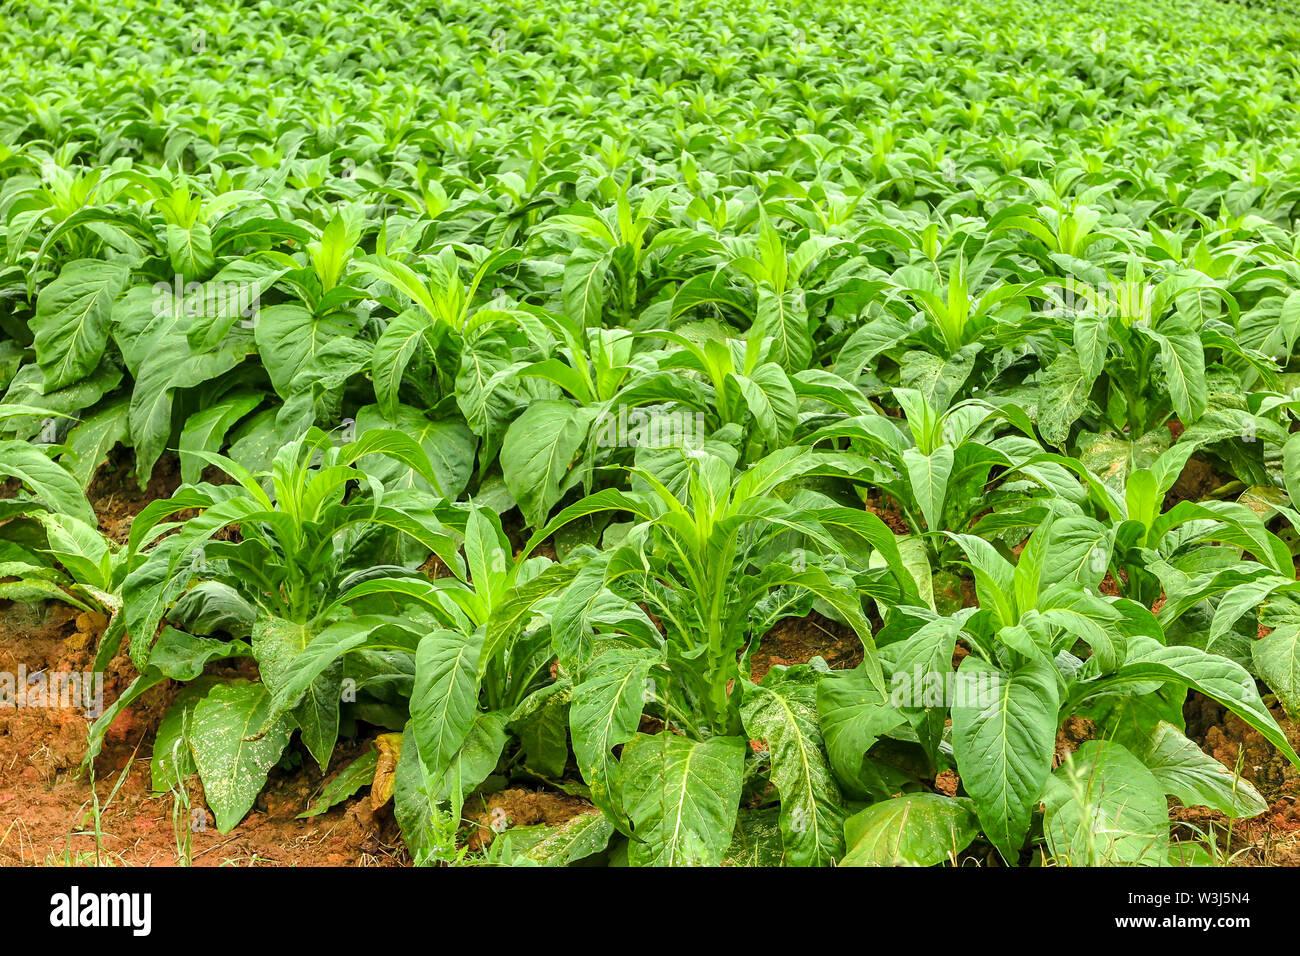 Tobacco plantation (Nicotiana tabacum), Petrolandia, Santa Catarina - Stock Image